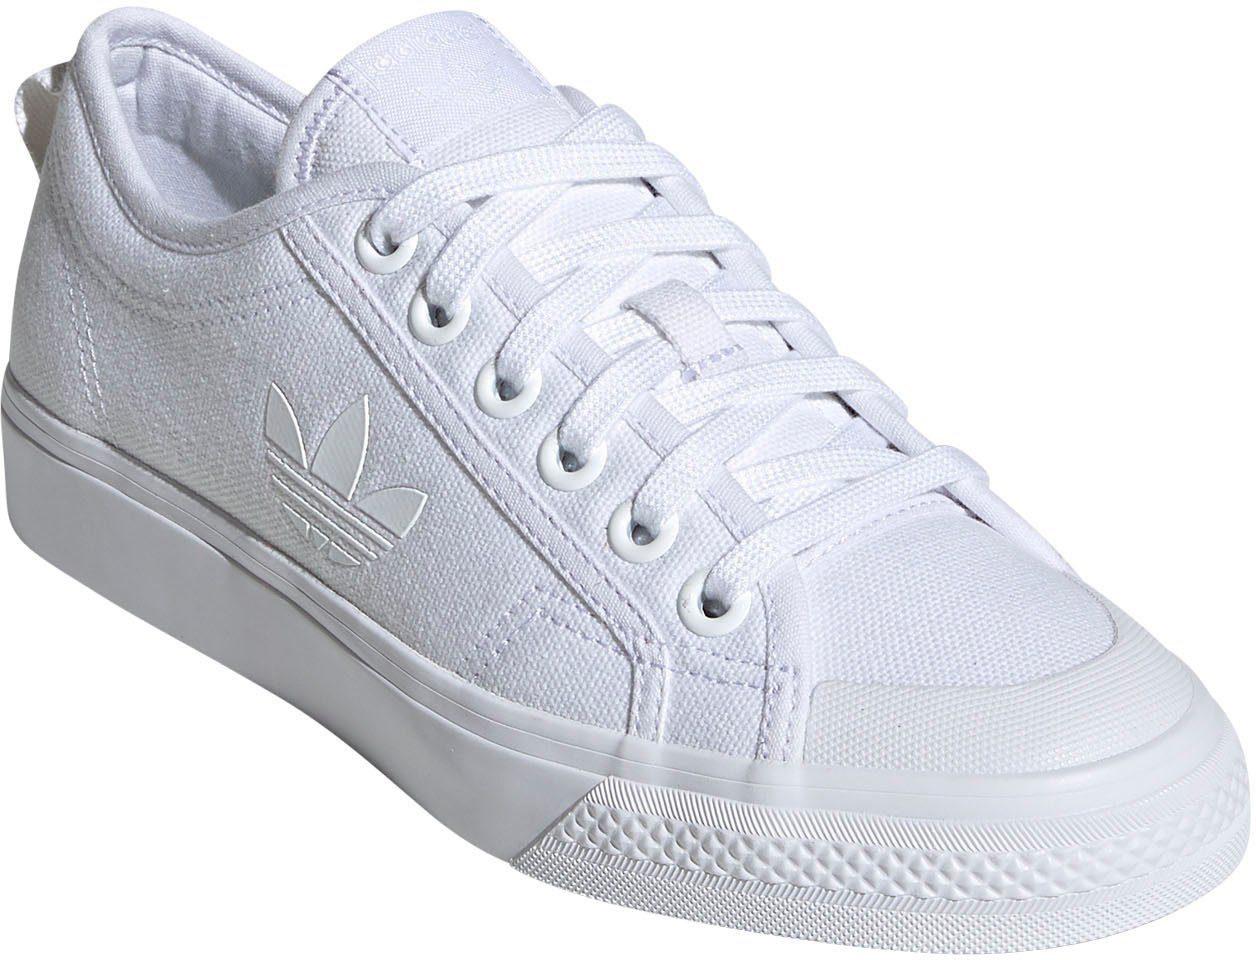 adidas Originals »NIZZA TREFOIL W« Sneaker kaufen | OTTO